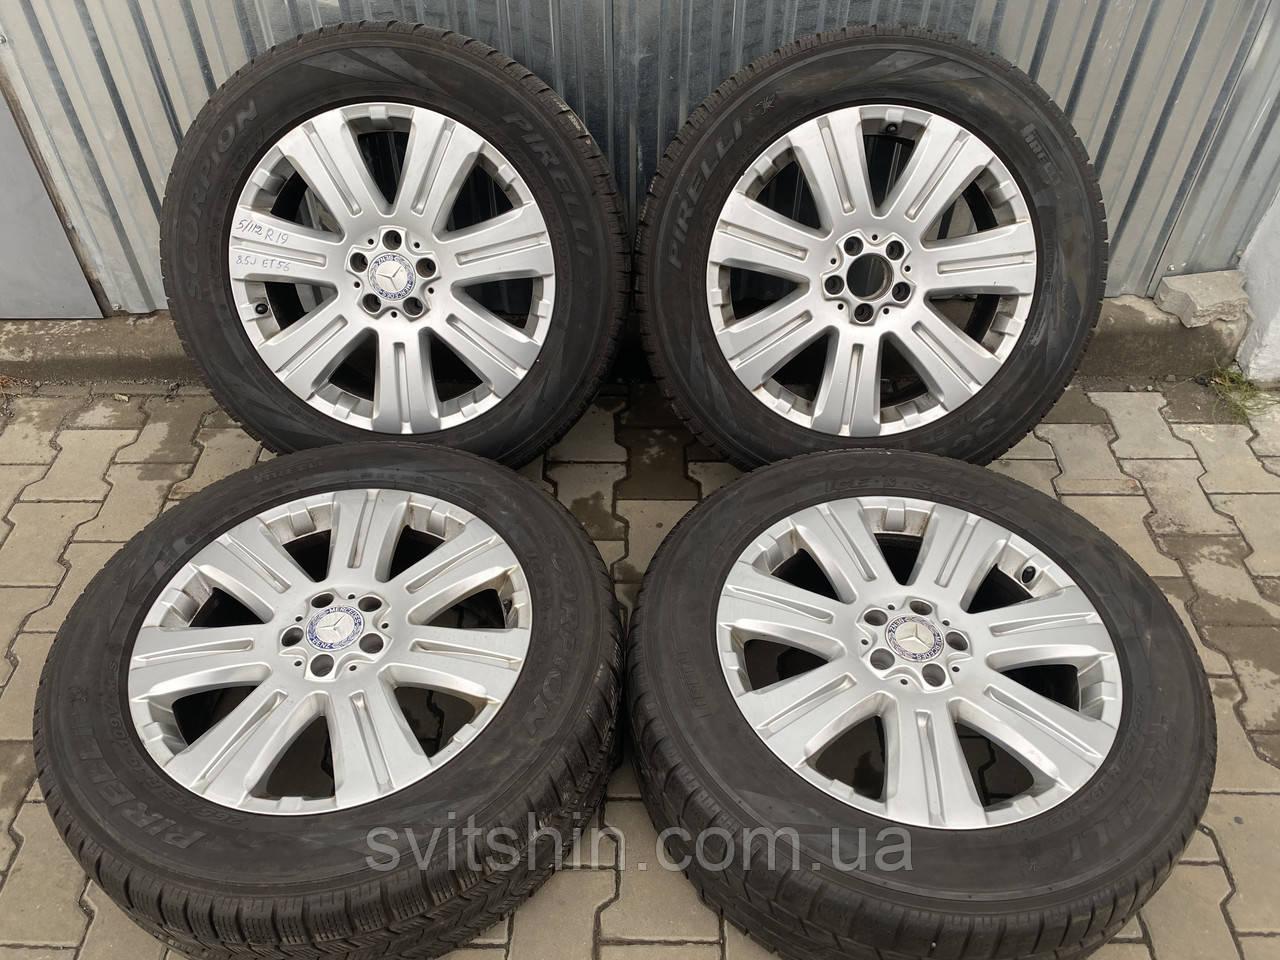 Диски Mercedes Benz GL-class 5/112 R19 8.5J ET56 + 265/55R19 PIRELLI Scorpion IceSnow